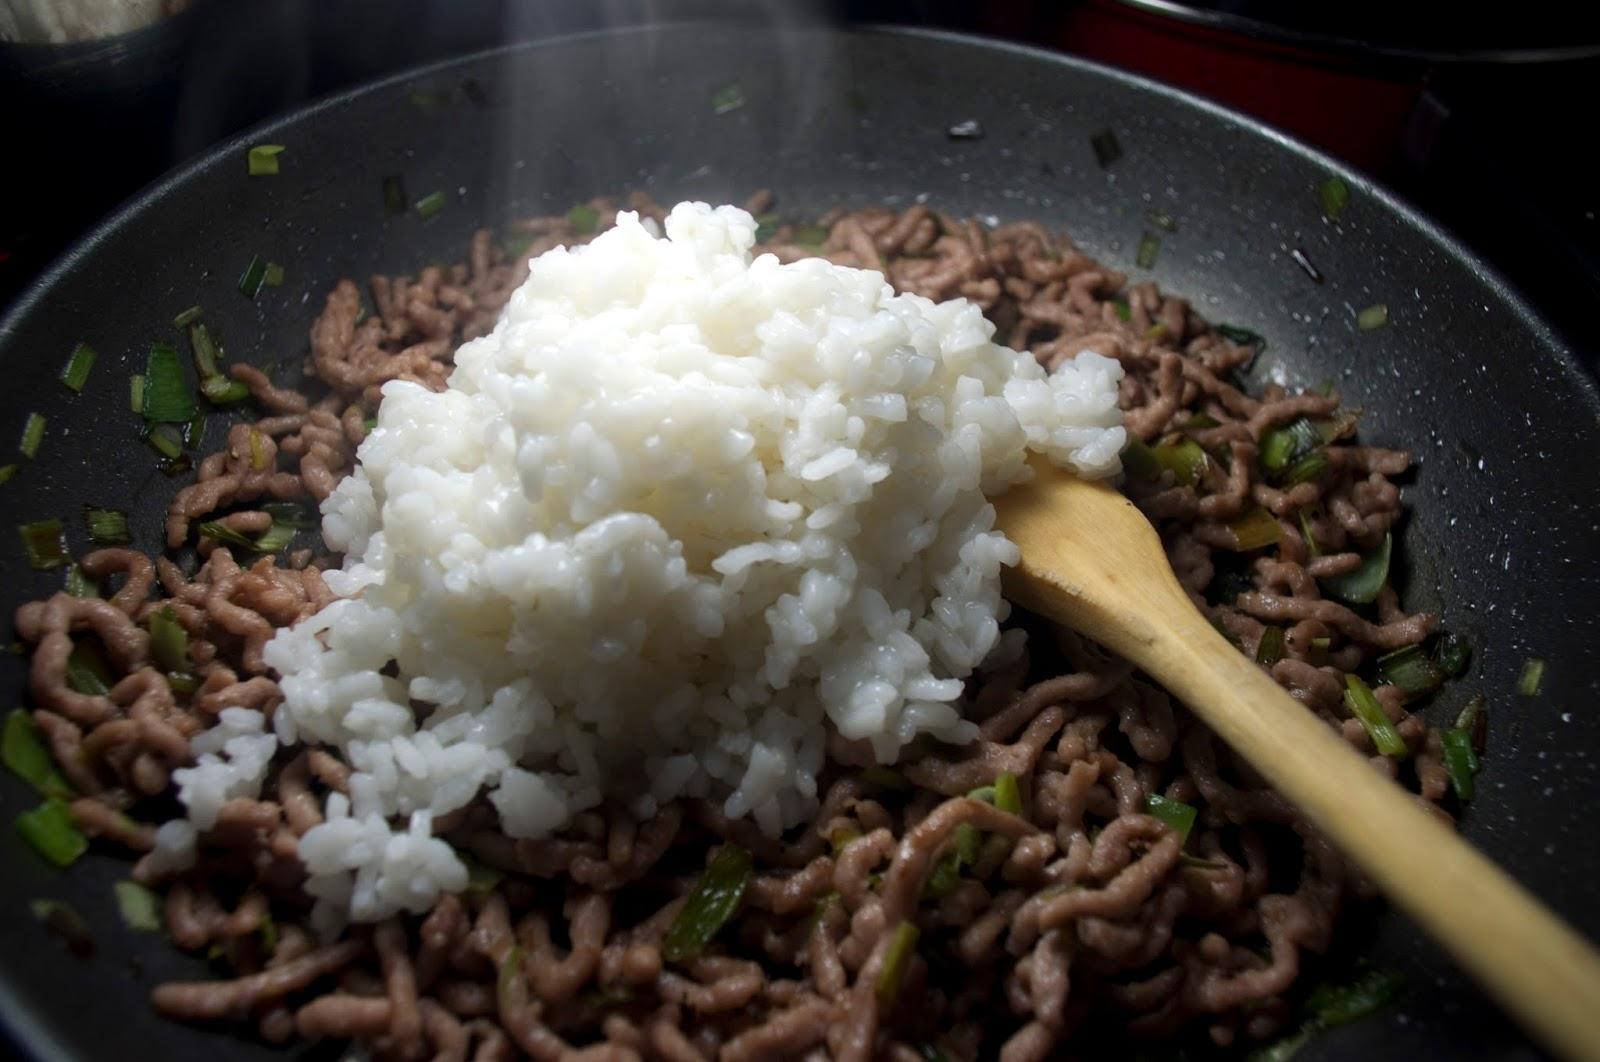 añadimos arroz